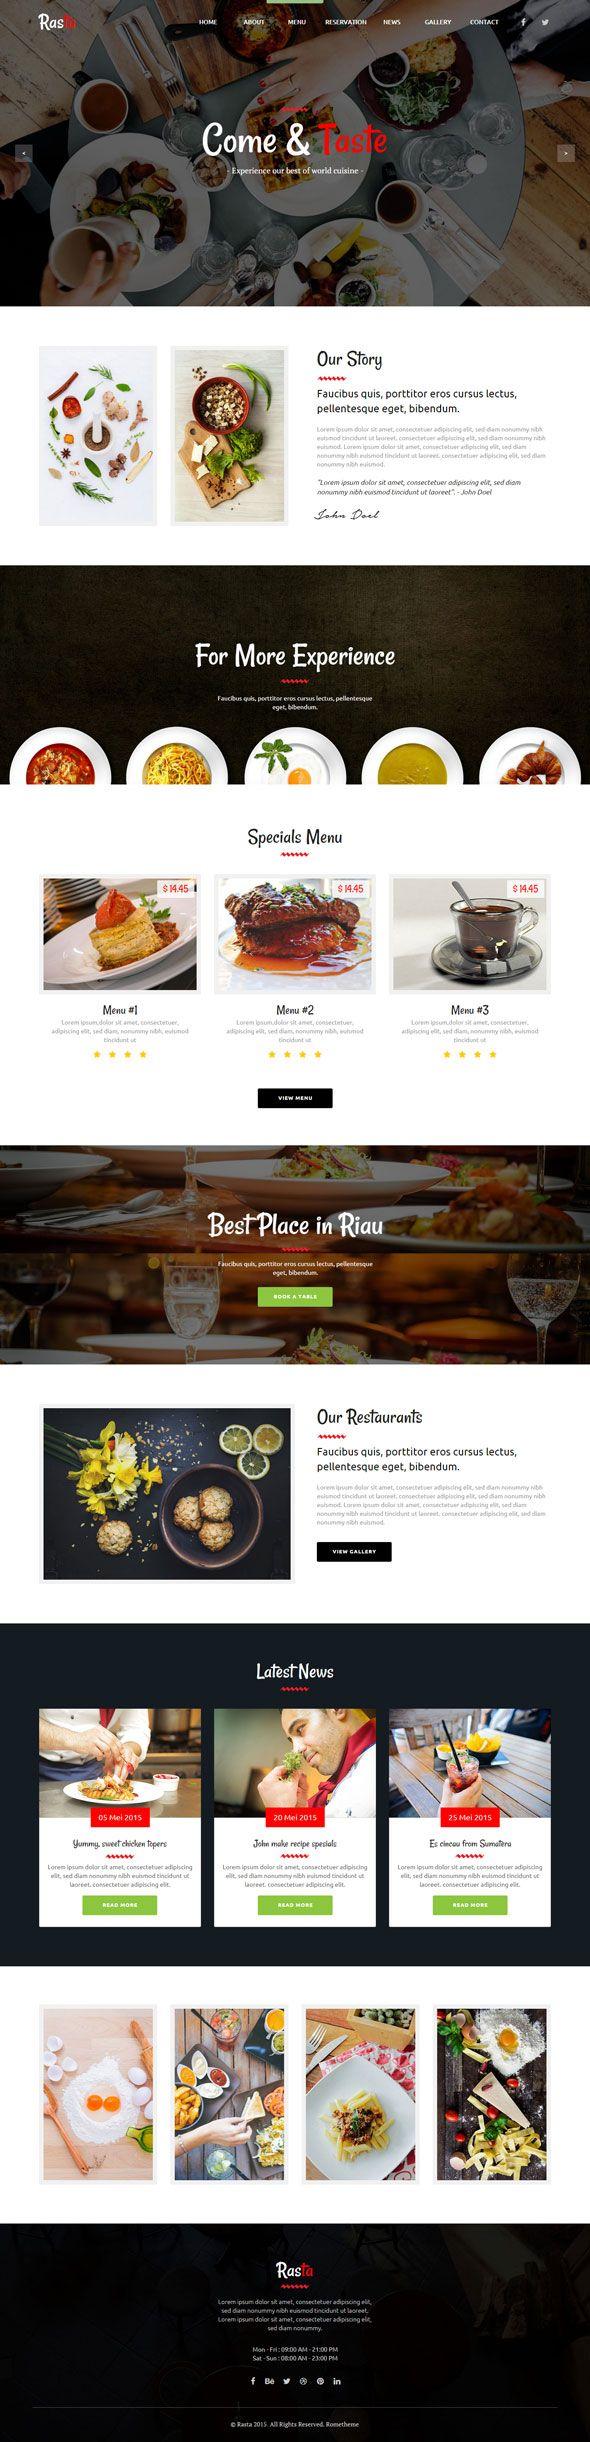 Rasta - Restaurant Muse Template by #rometheme #themeforest